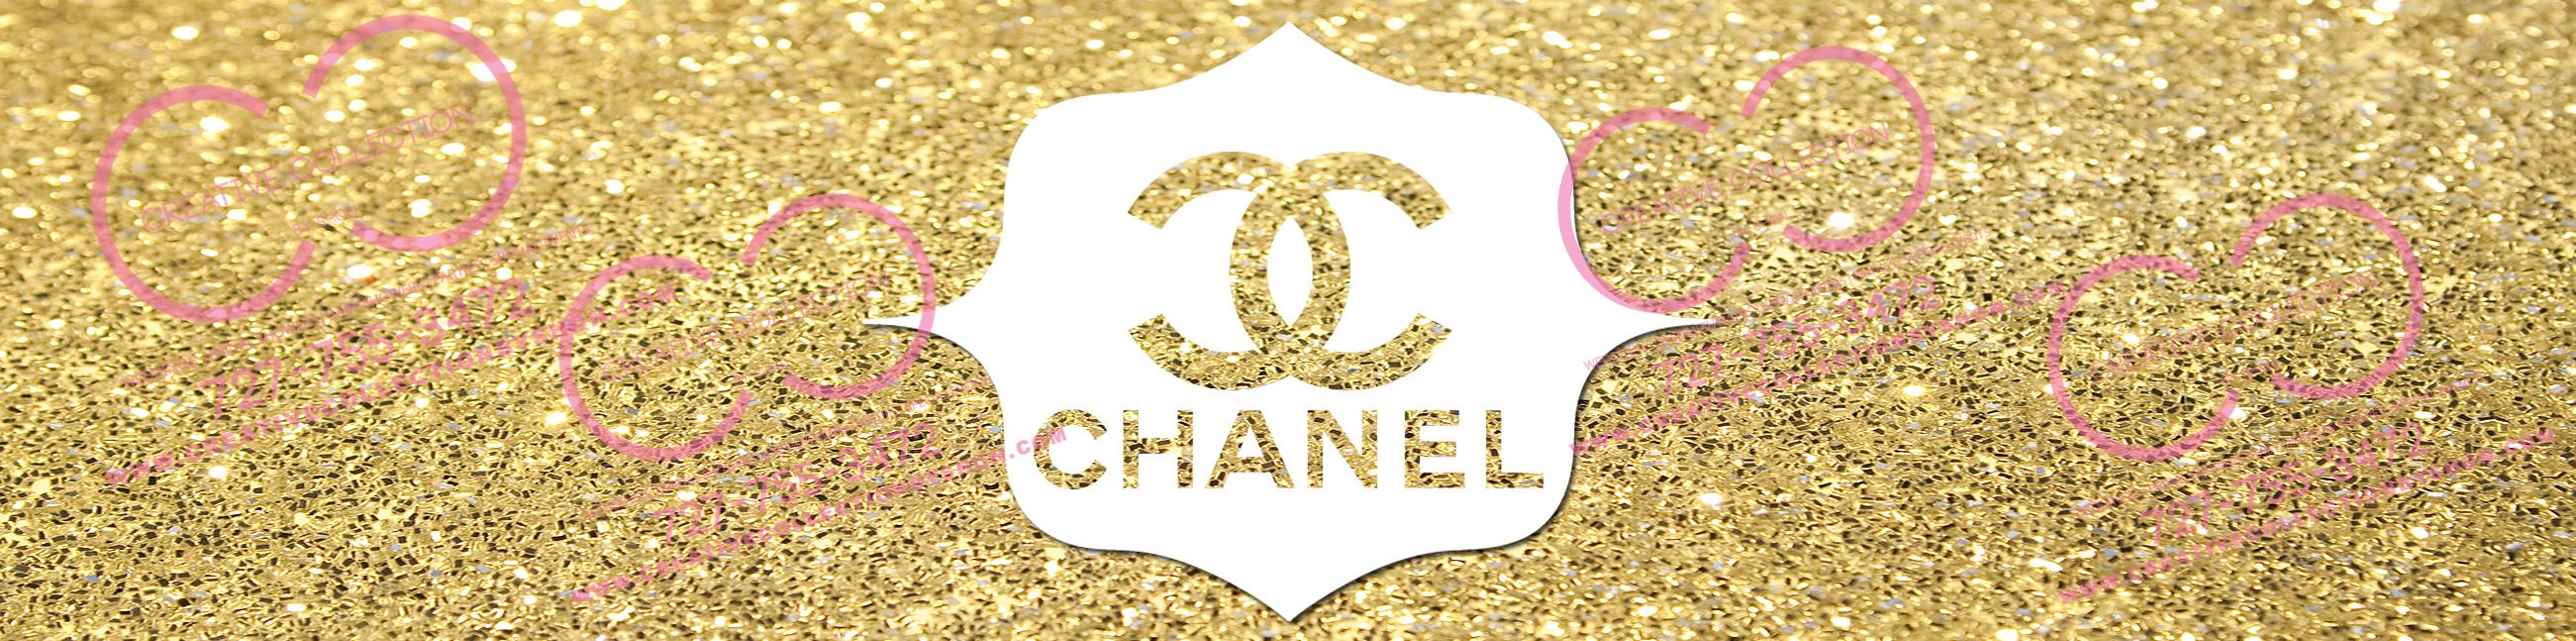 Chanel Water Bottle Label Gold